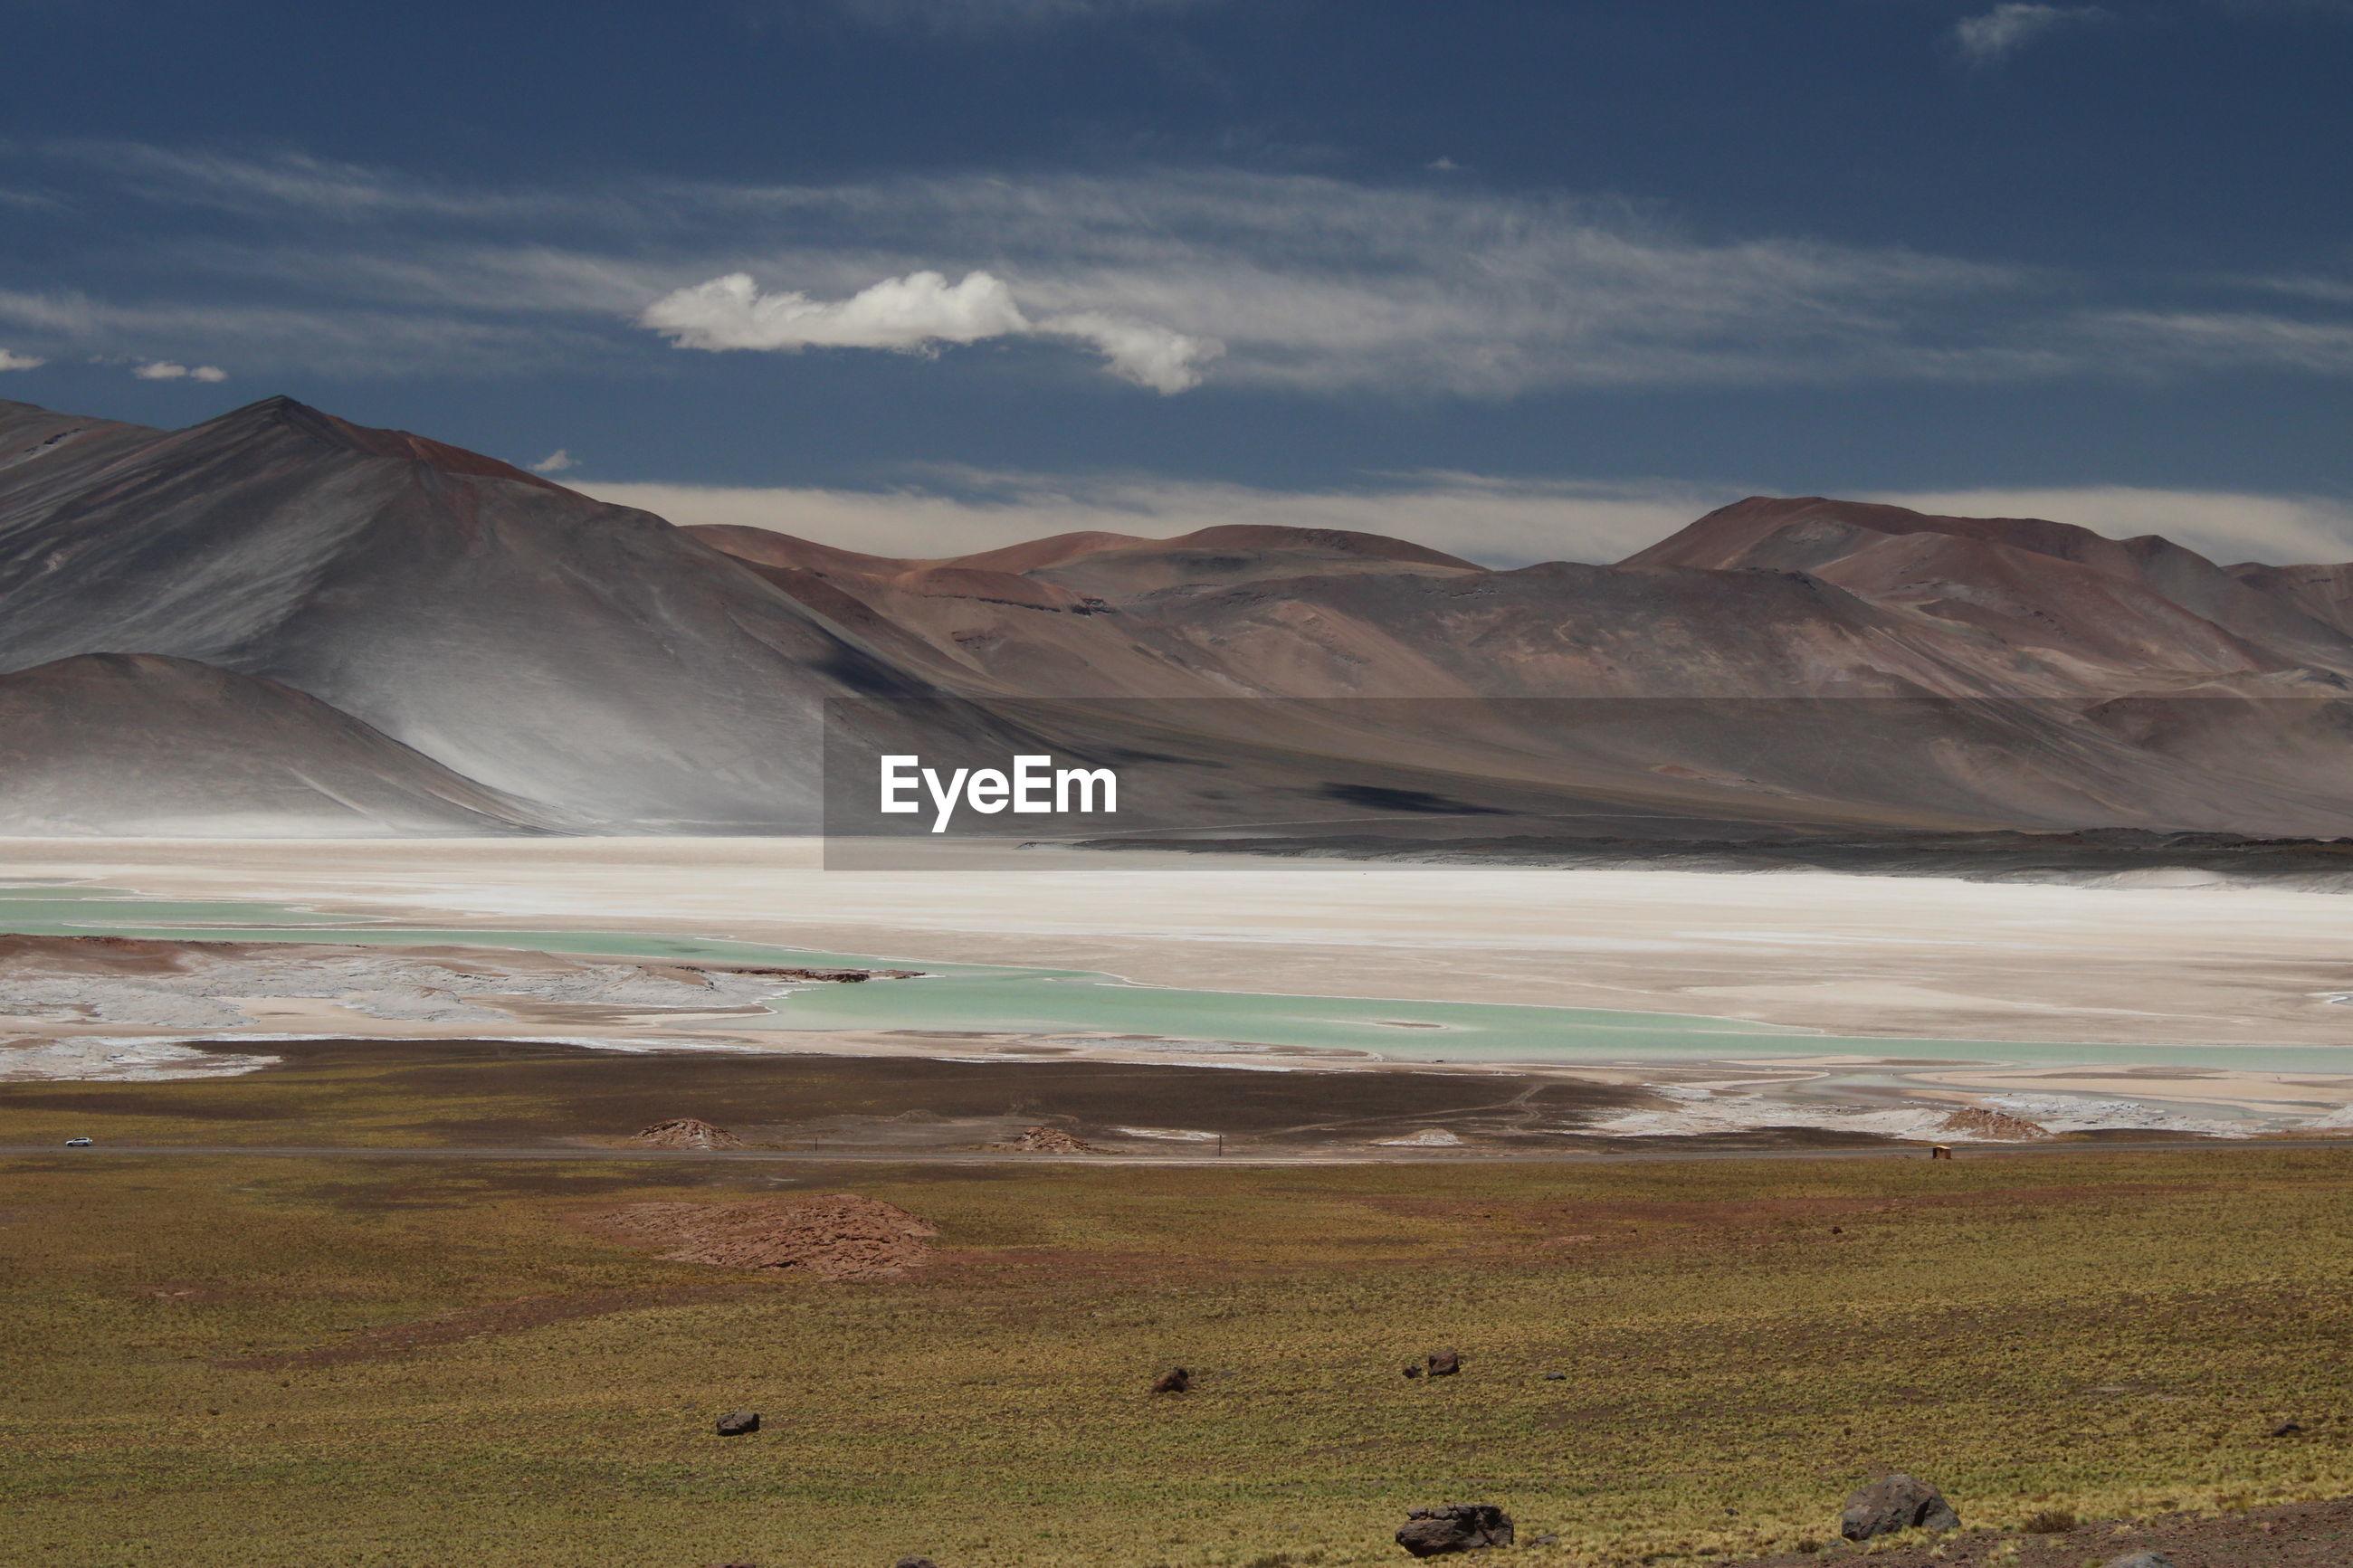 Red mountains and blue salty lagoon at piedras rojas, atacama desert, chile